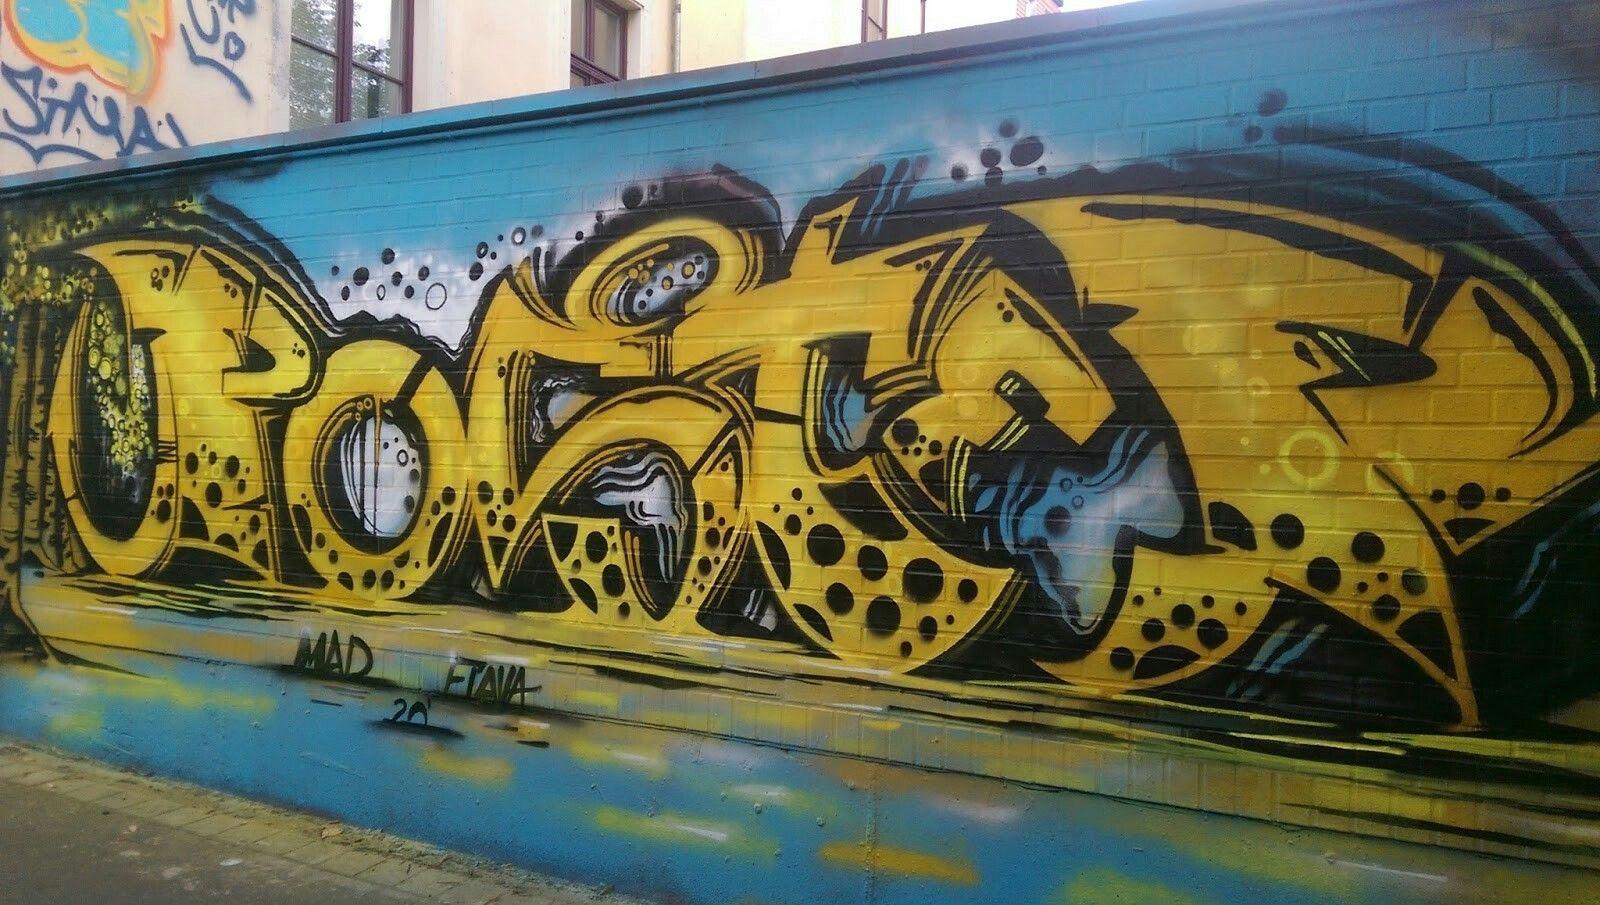 Pin by - S1n - on Graffiti | Pinterest | Graffiti and Street art